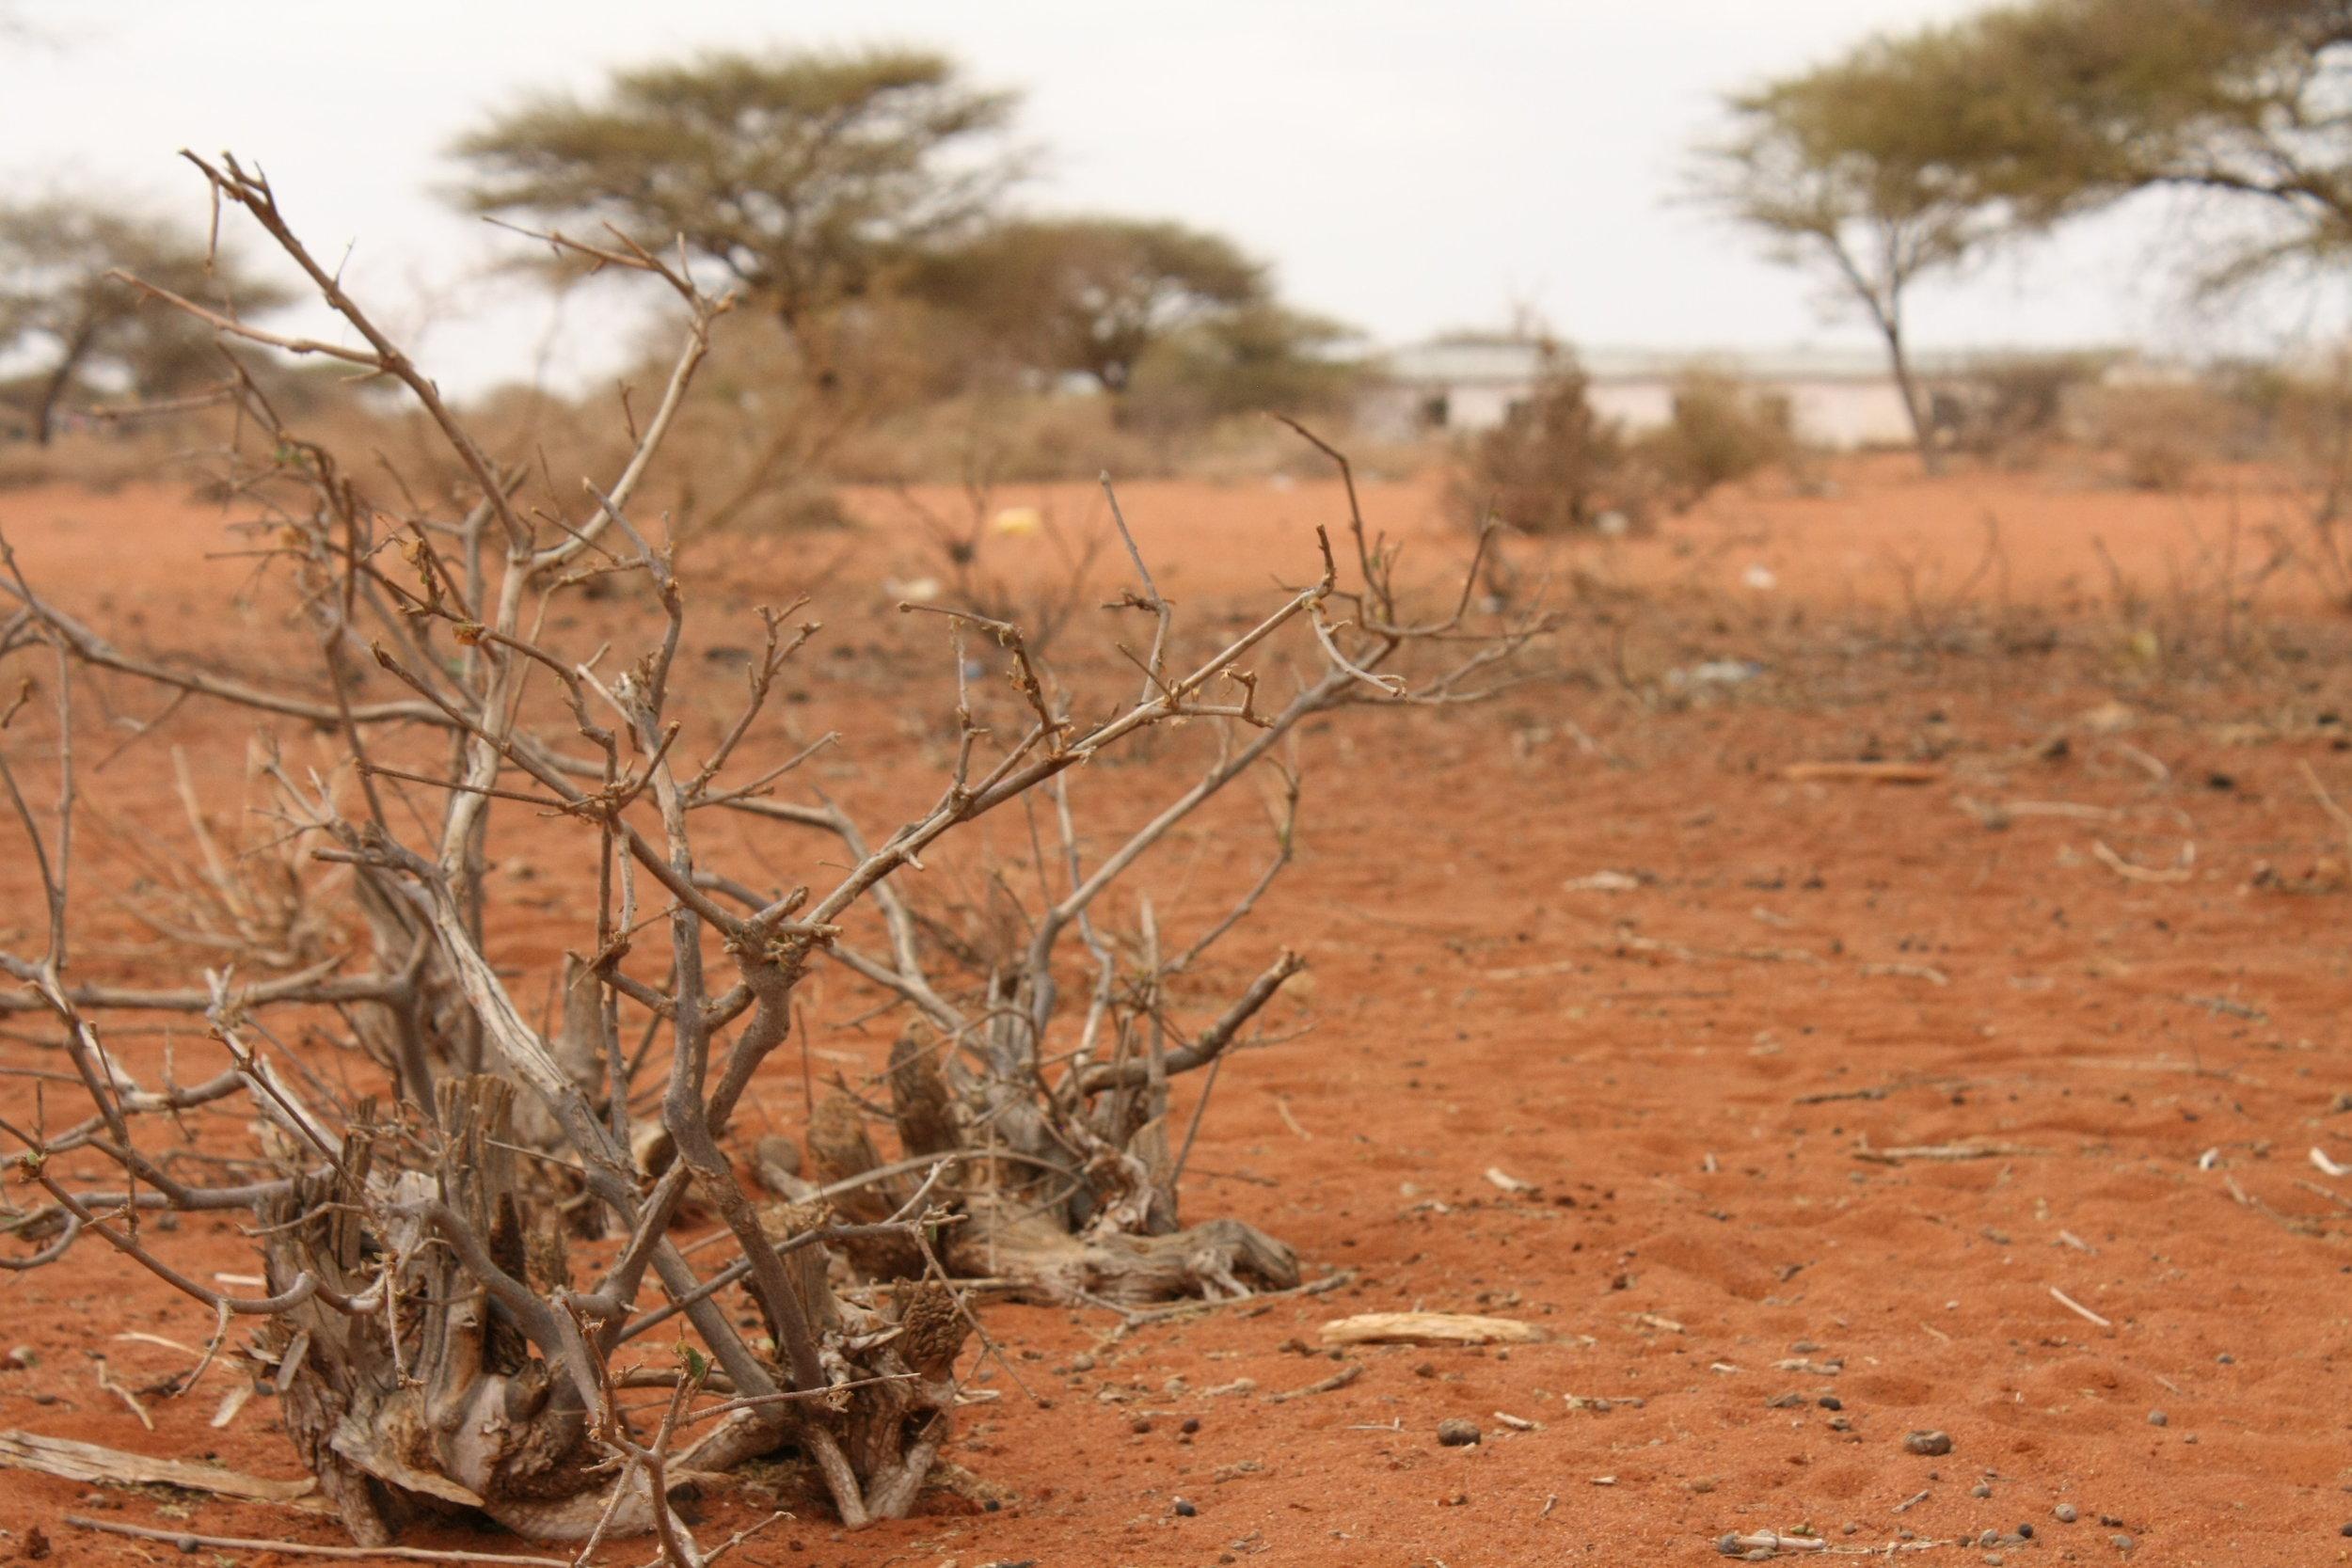 Oxfam_East_Africa_-_The_barren_landscape_of_Kulaley_village.jpg